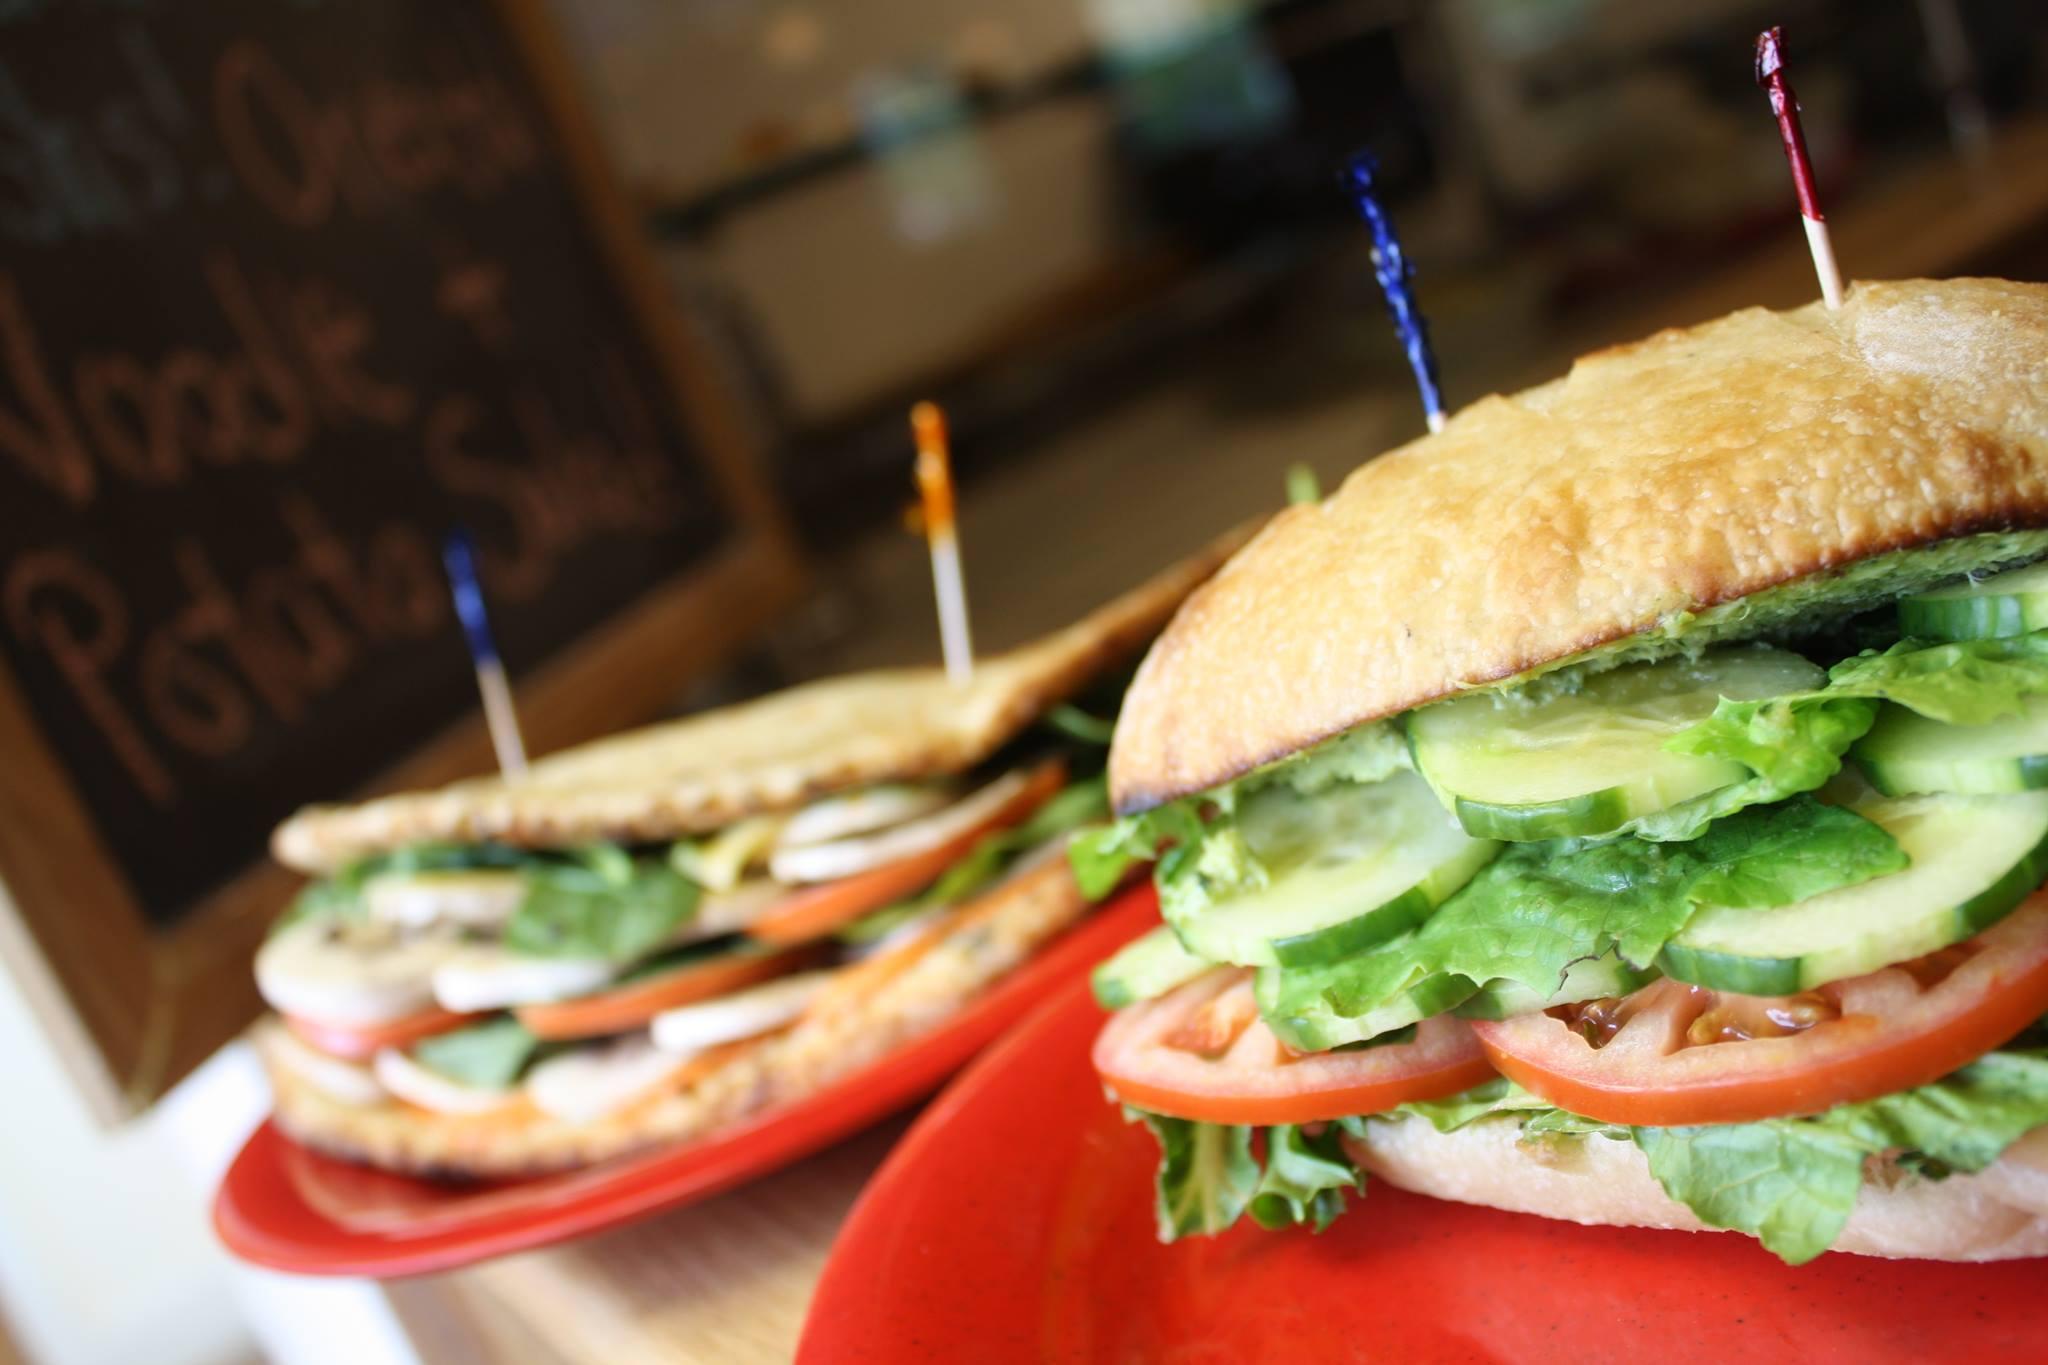 Ramuntos_pizza_clairemont_Keene_Flashfire_pizza_and sandwiches.jpg